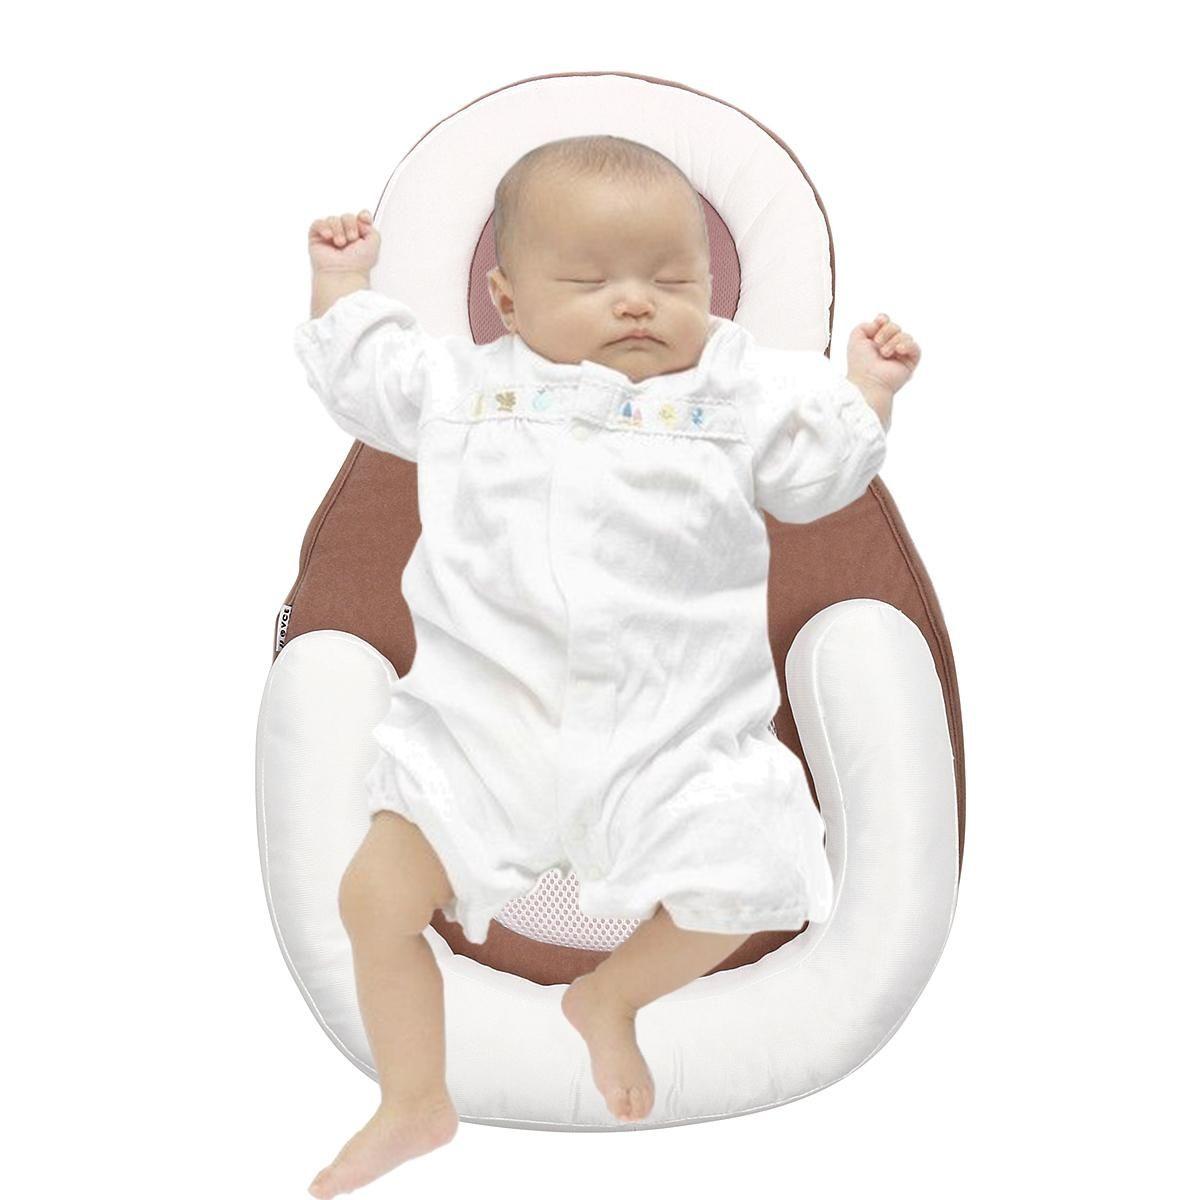 Portable Baby Bed Infant Bassinet Crib Cradle Nursery Travel Newborn Sleeper Bag